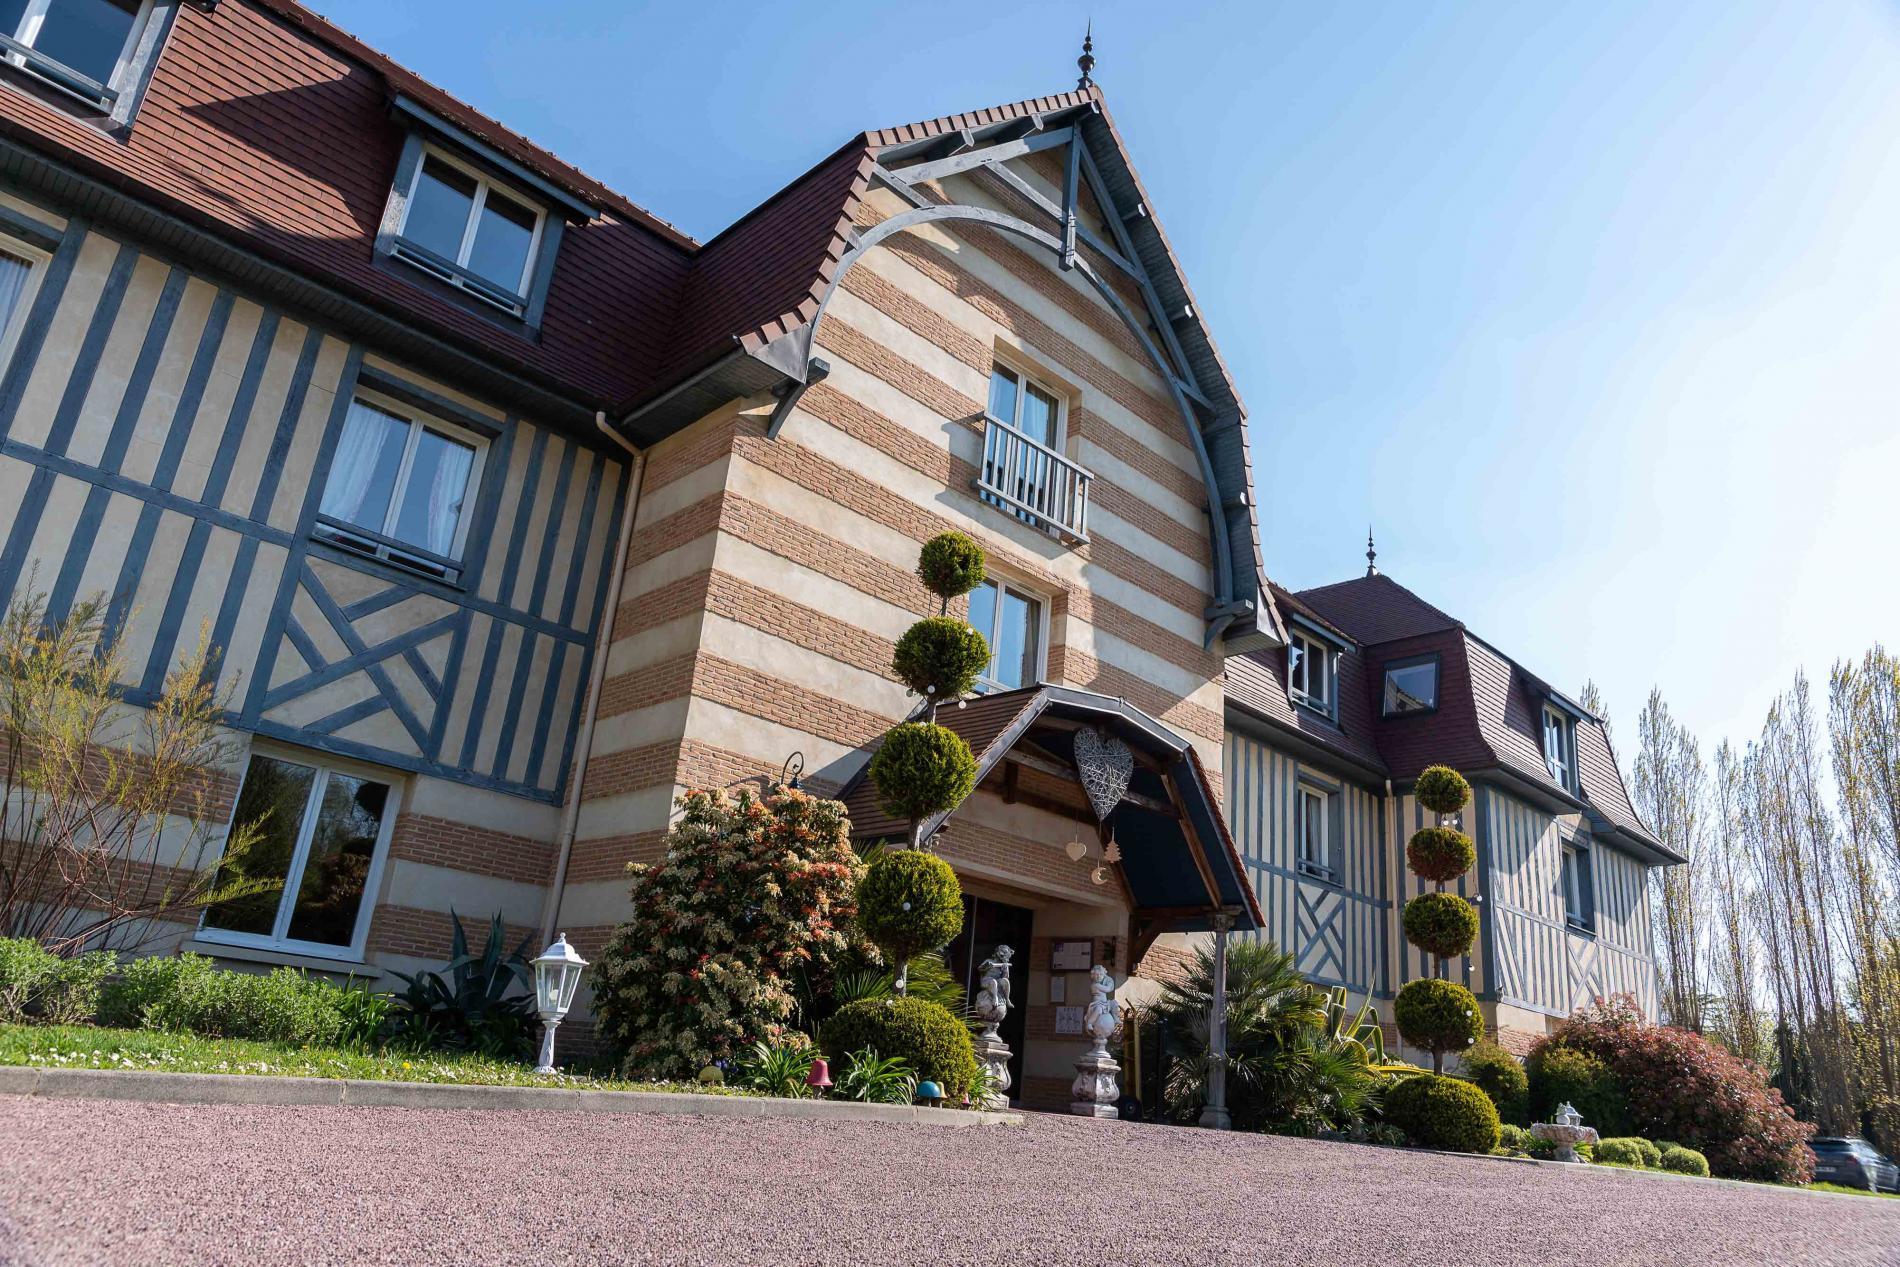 Séminaire Normandie - Hotel